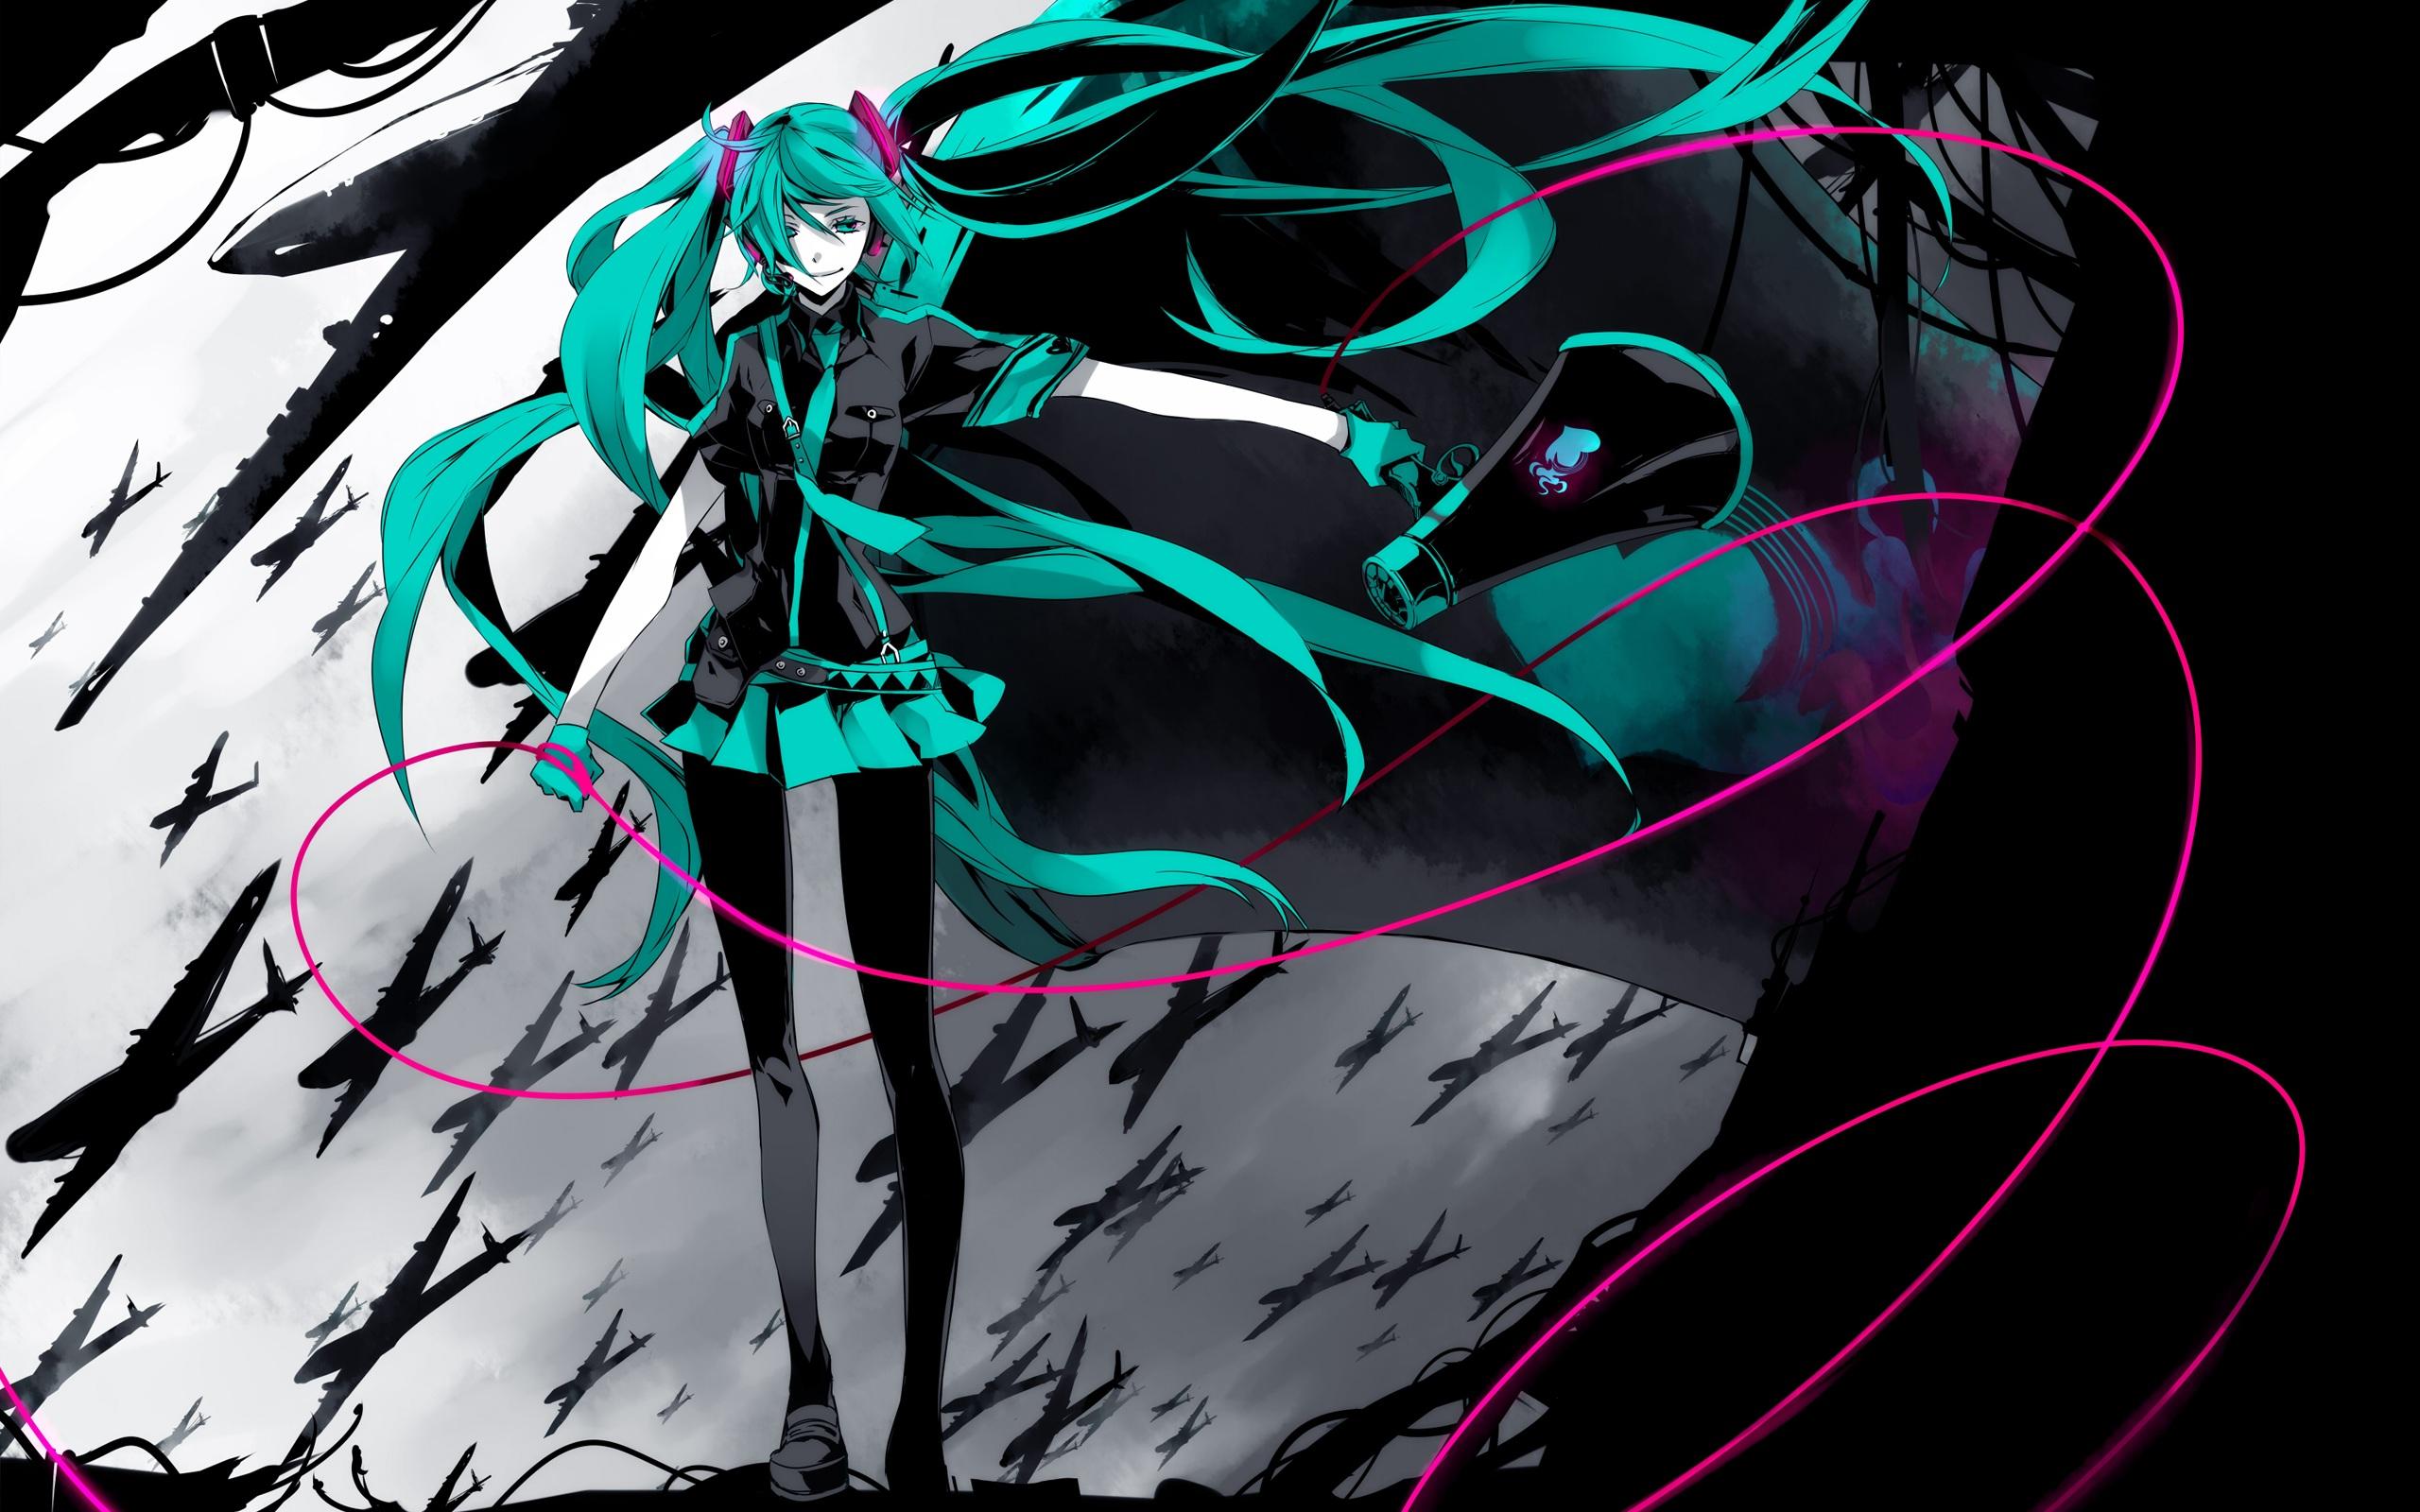 Love is war hd wallpaper background image 2560x1600 - Anime war wallpaper ...